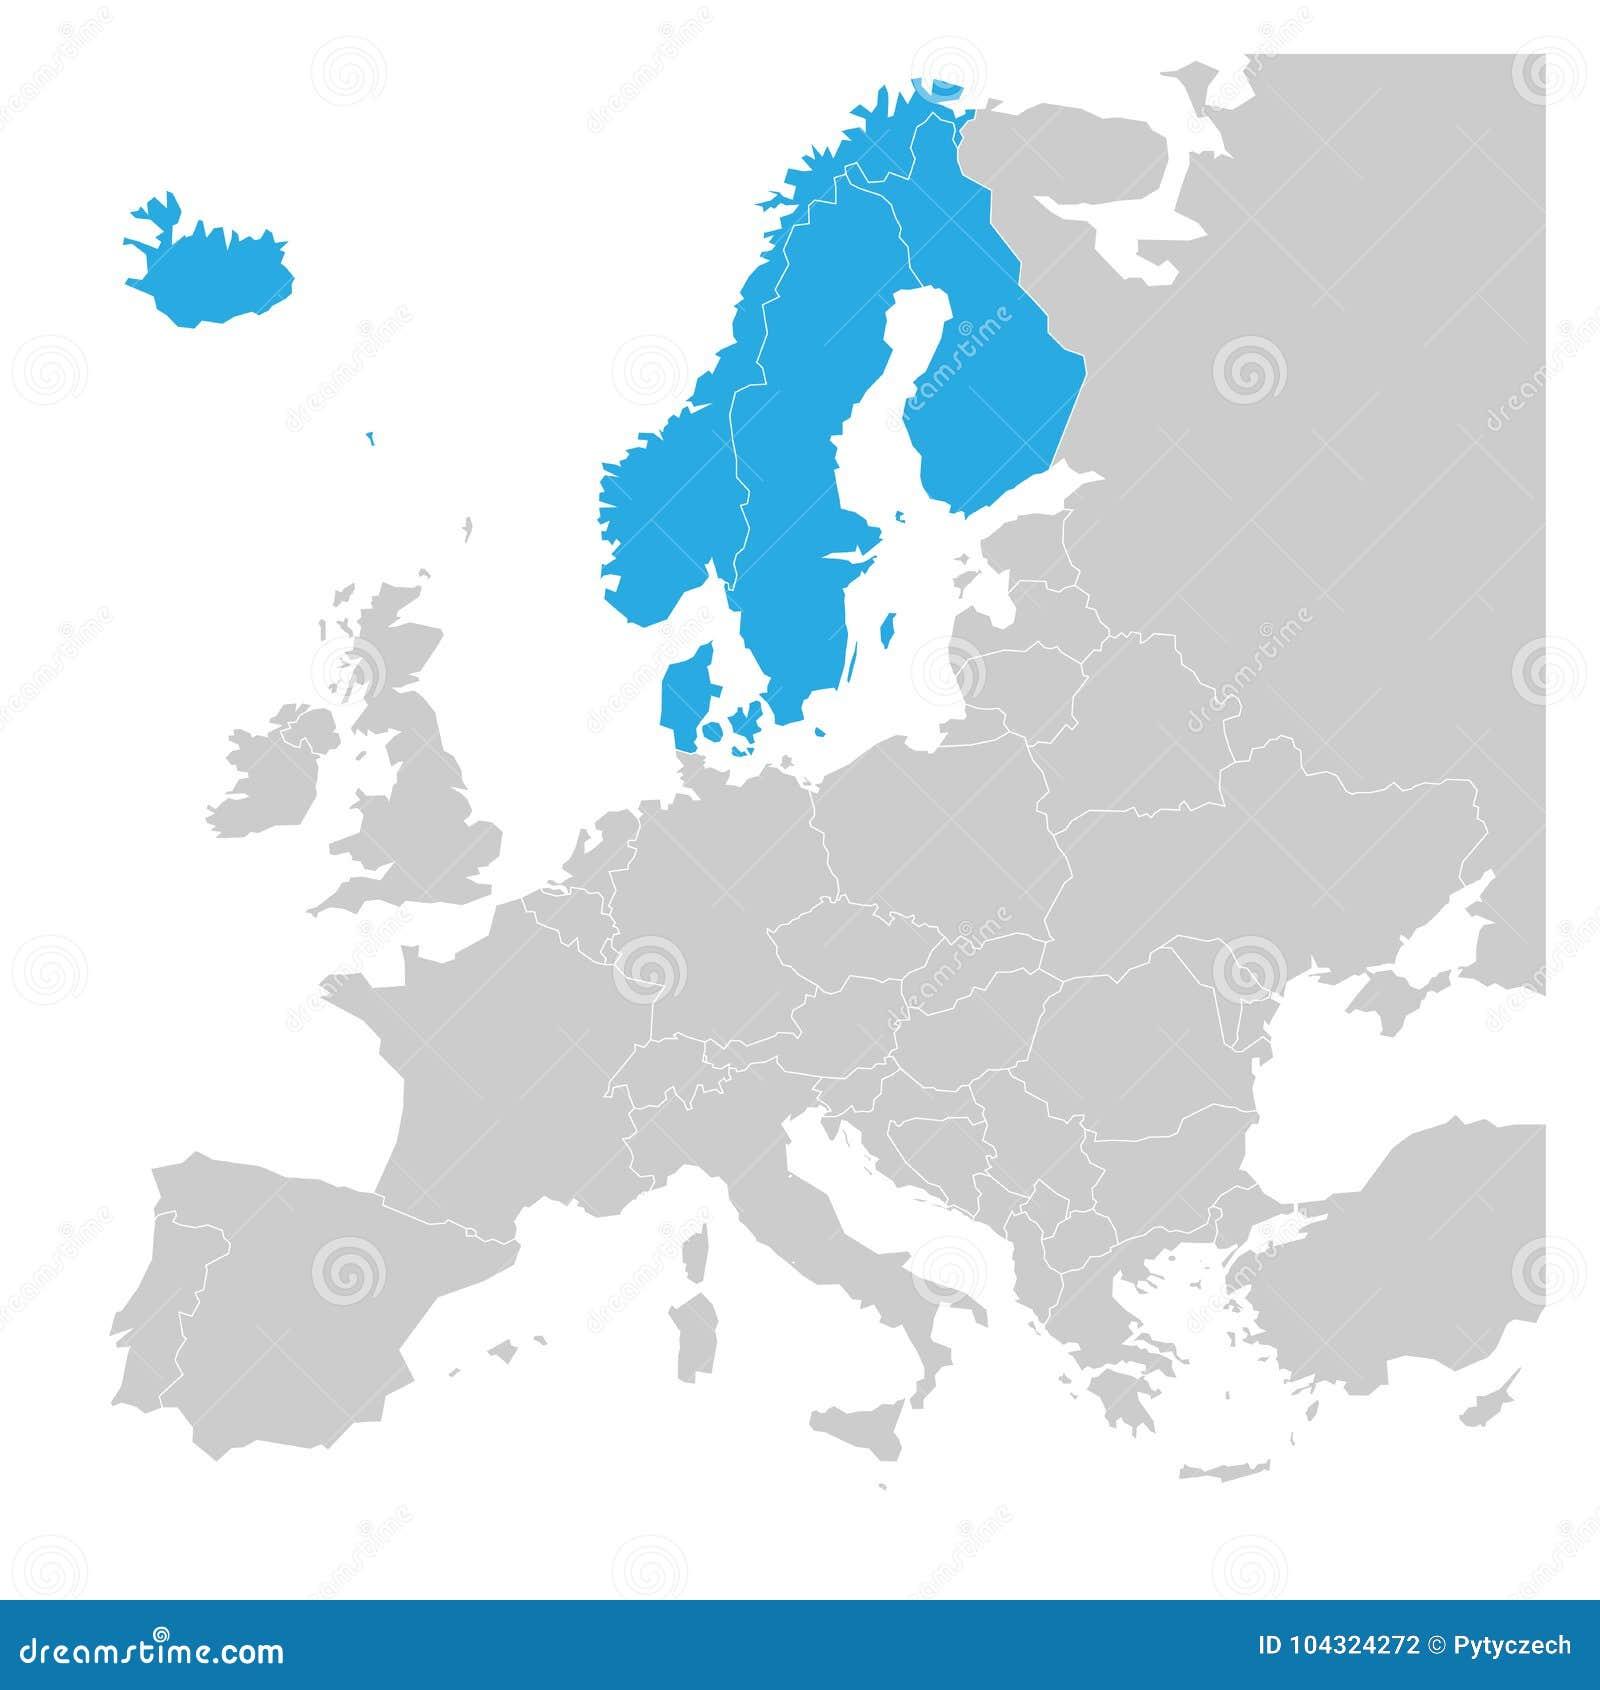 Karte Norwegen Dänemark.Skandinavier Erklärt Dänemark Norwegen Finnland Schweden Und